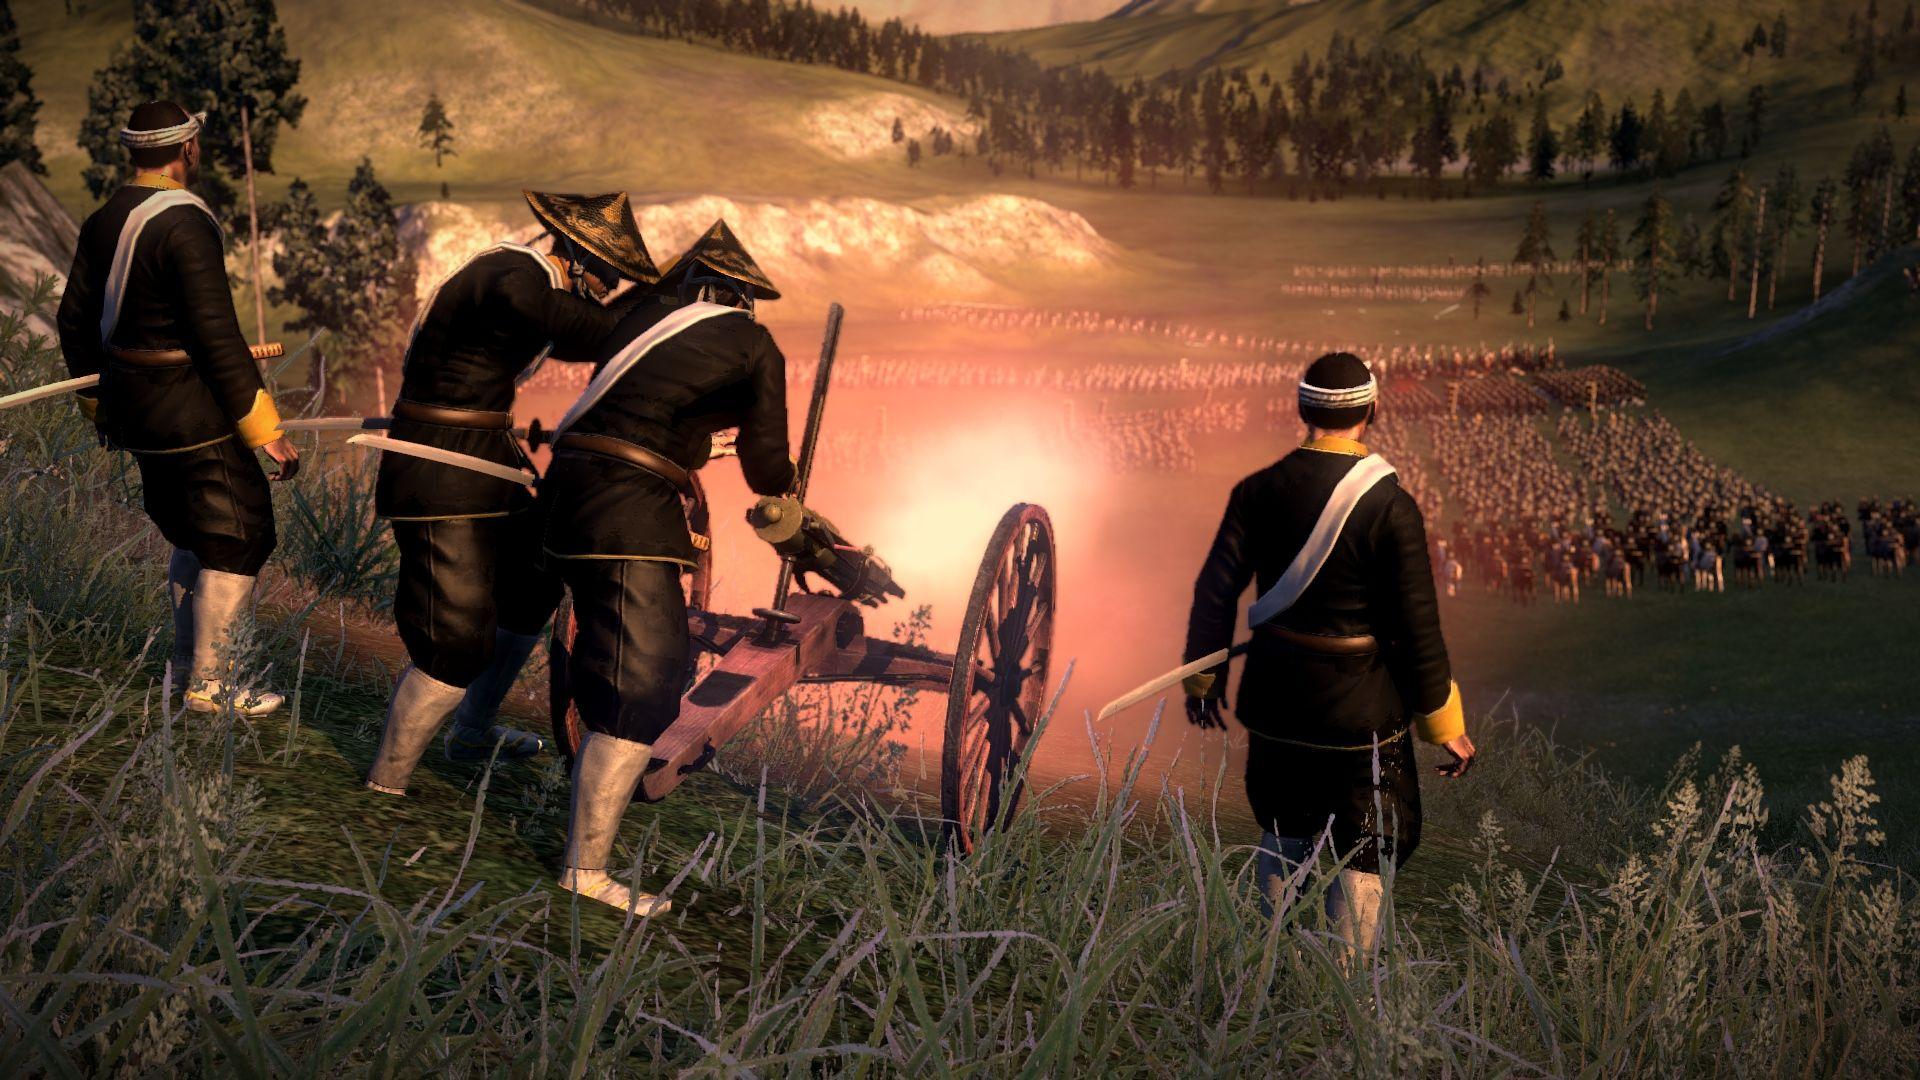 total war: shogun 2 - fall of the samurai on steam